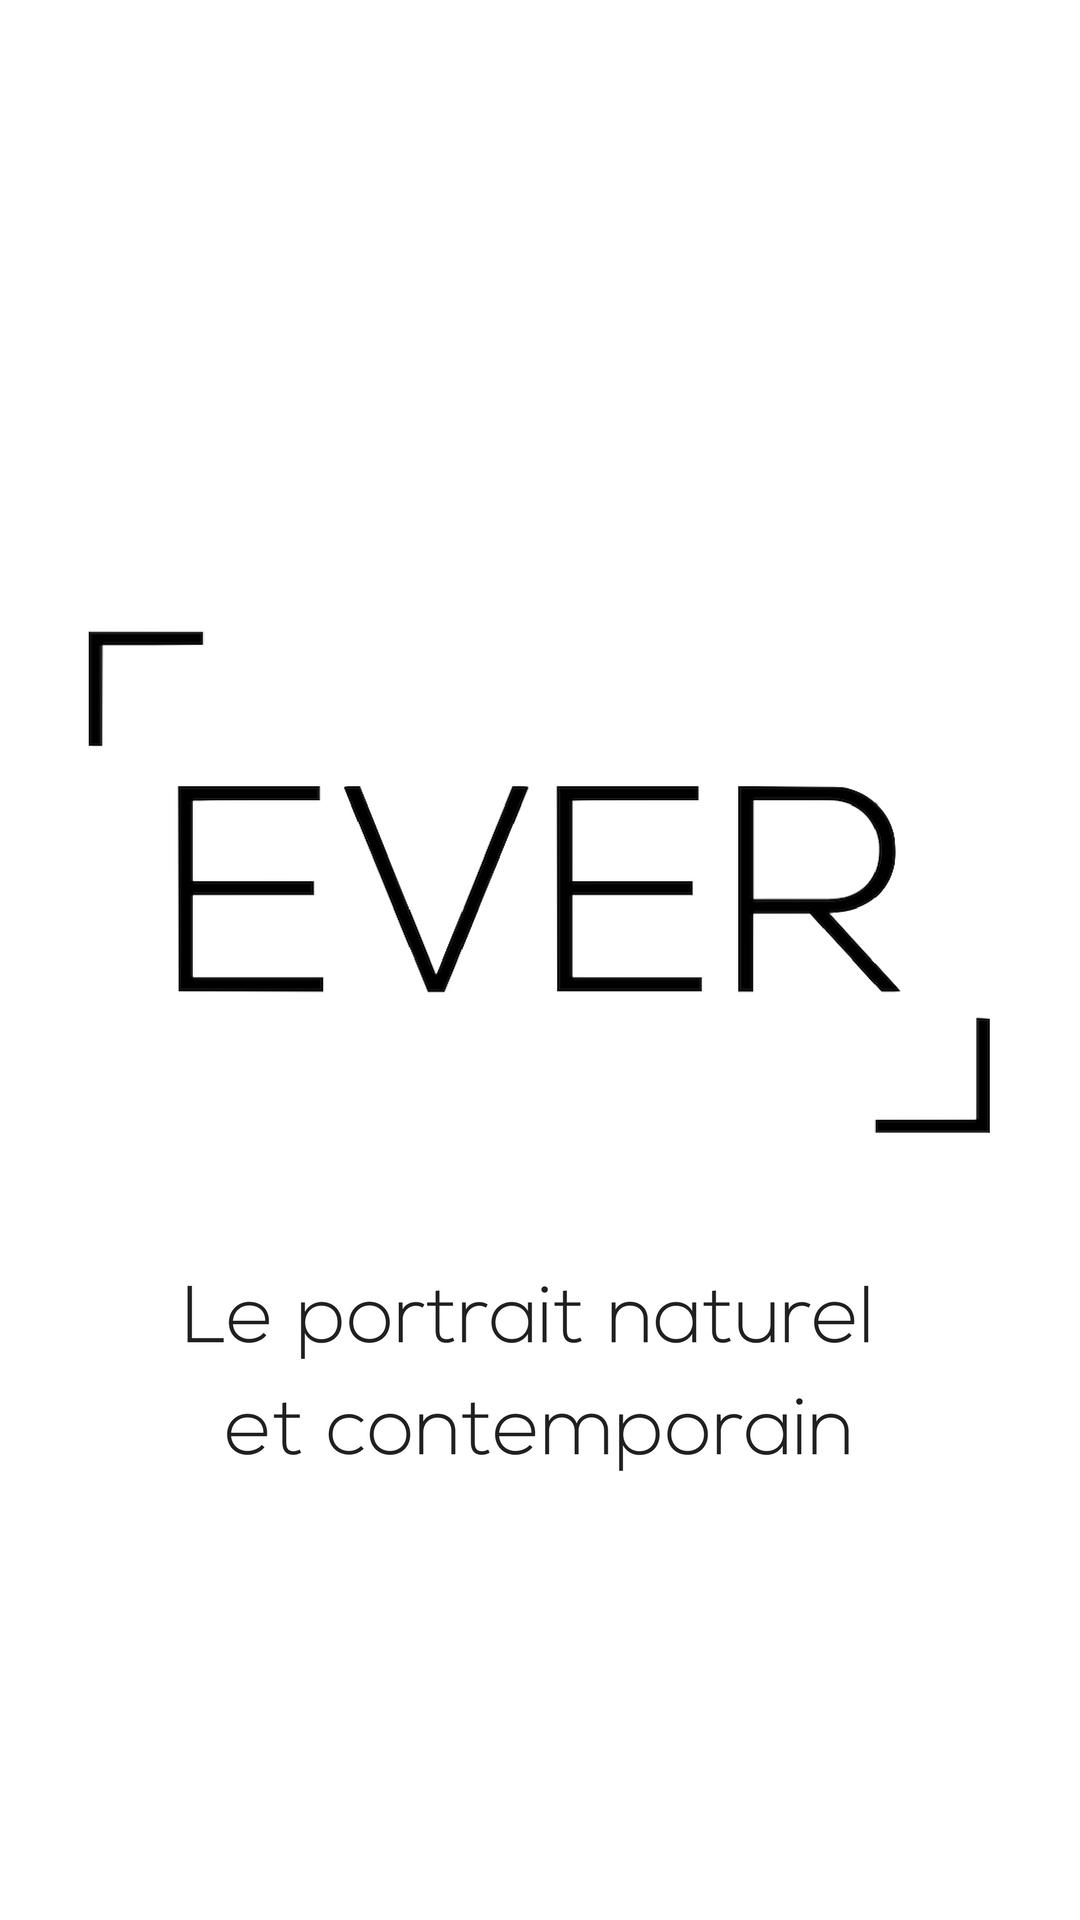 FB cover vertical.jpg